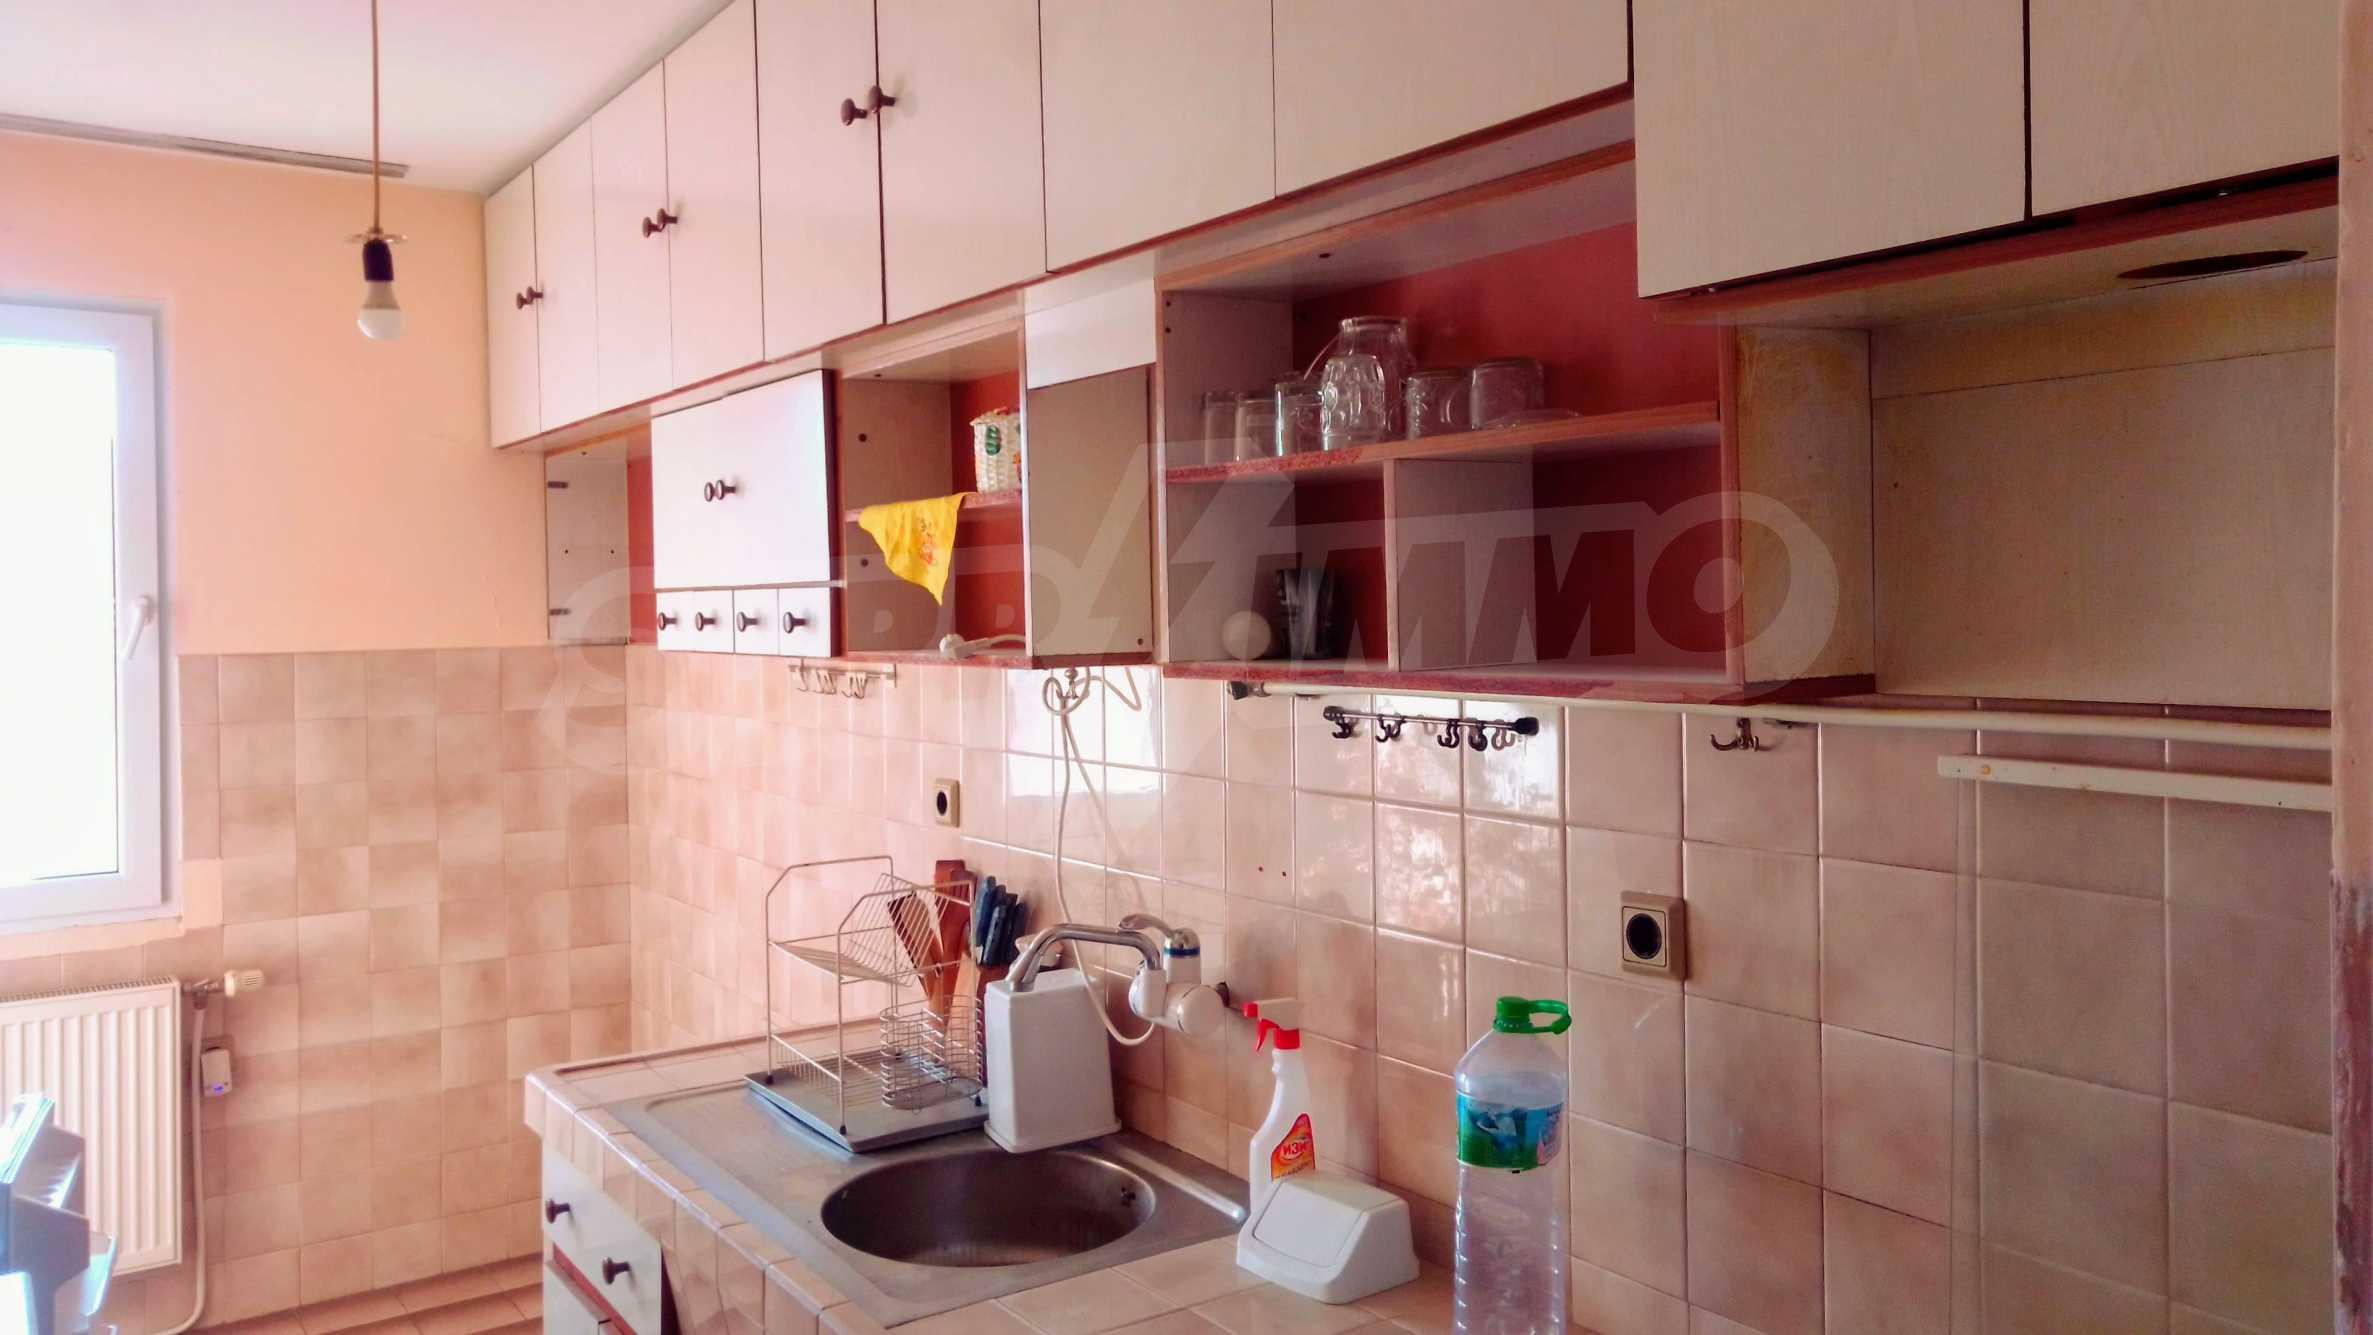 Слънчев тристаен апартамент в град Севлиево  3